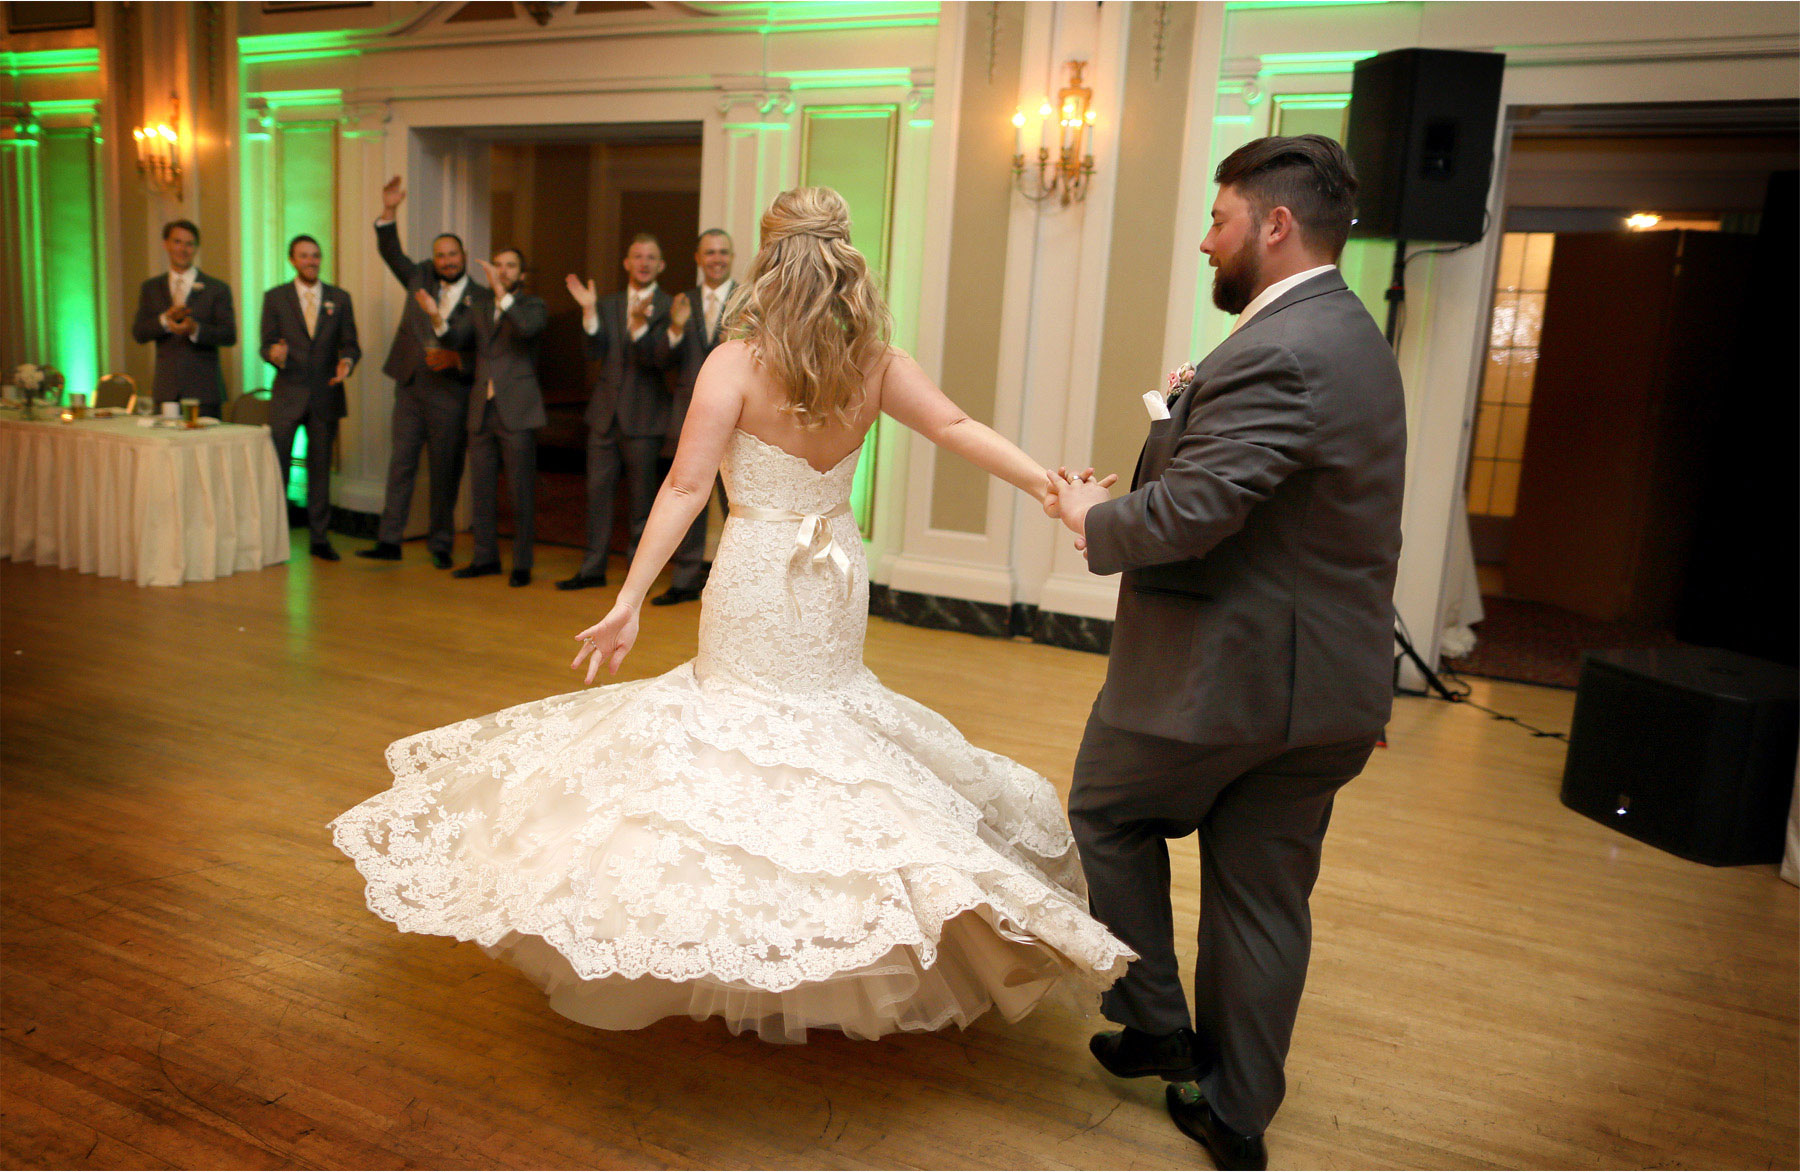 16-Duluth-Minnesota-Wedding-Photographer-by-Andrew-Vick-Photography-Fall-Autumn-Greysolon-Ballroom-Reception-Bride-Groom-Grand-March-Twirl-Molly-and-Carson.jpg